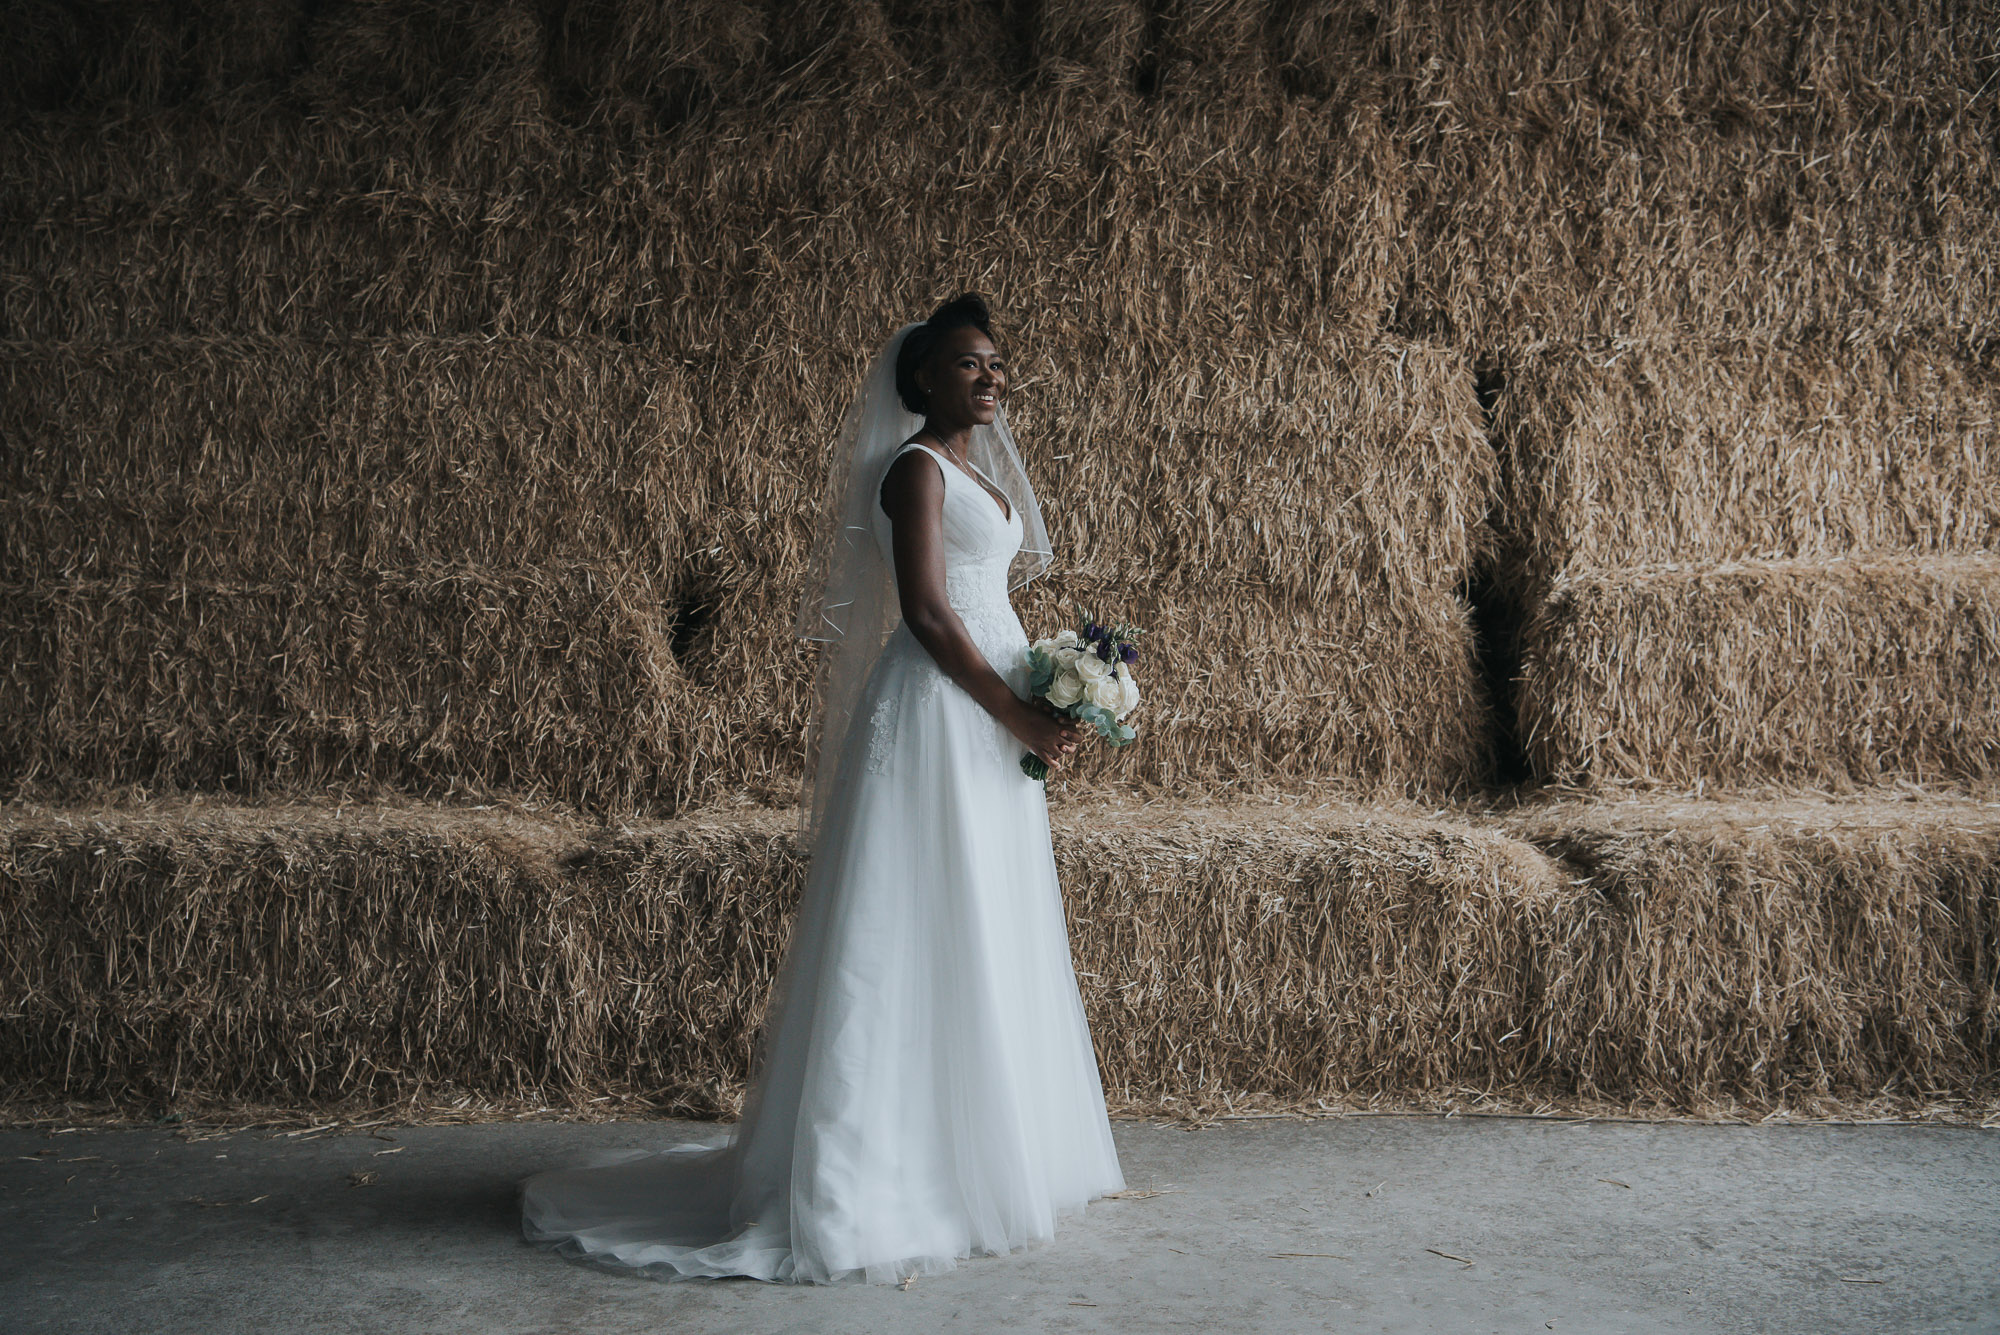 Owen HOuse Wedding Barn WEdding Photographer cheshire adam joe roberts photography (27 of 36).jpg